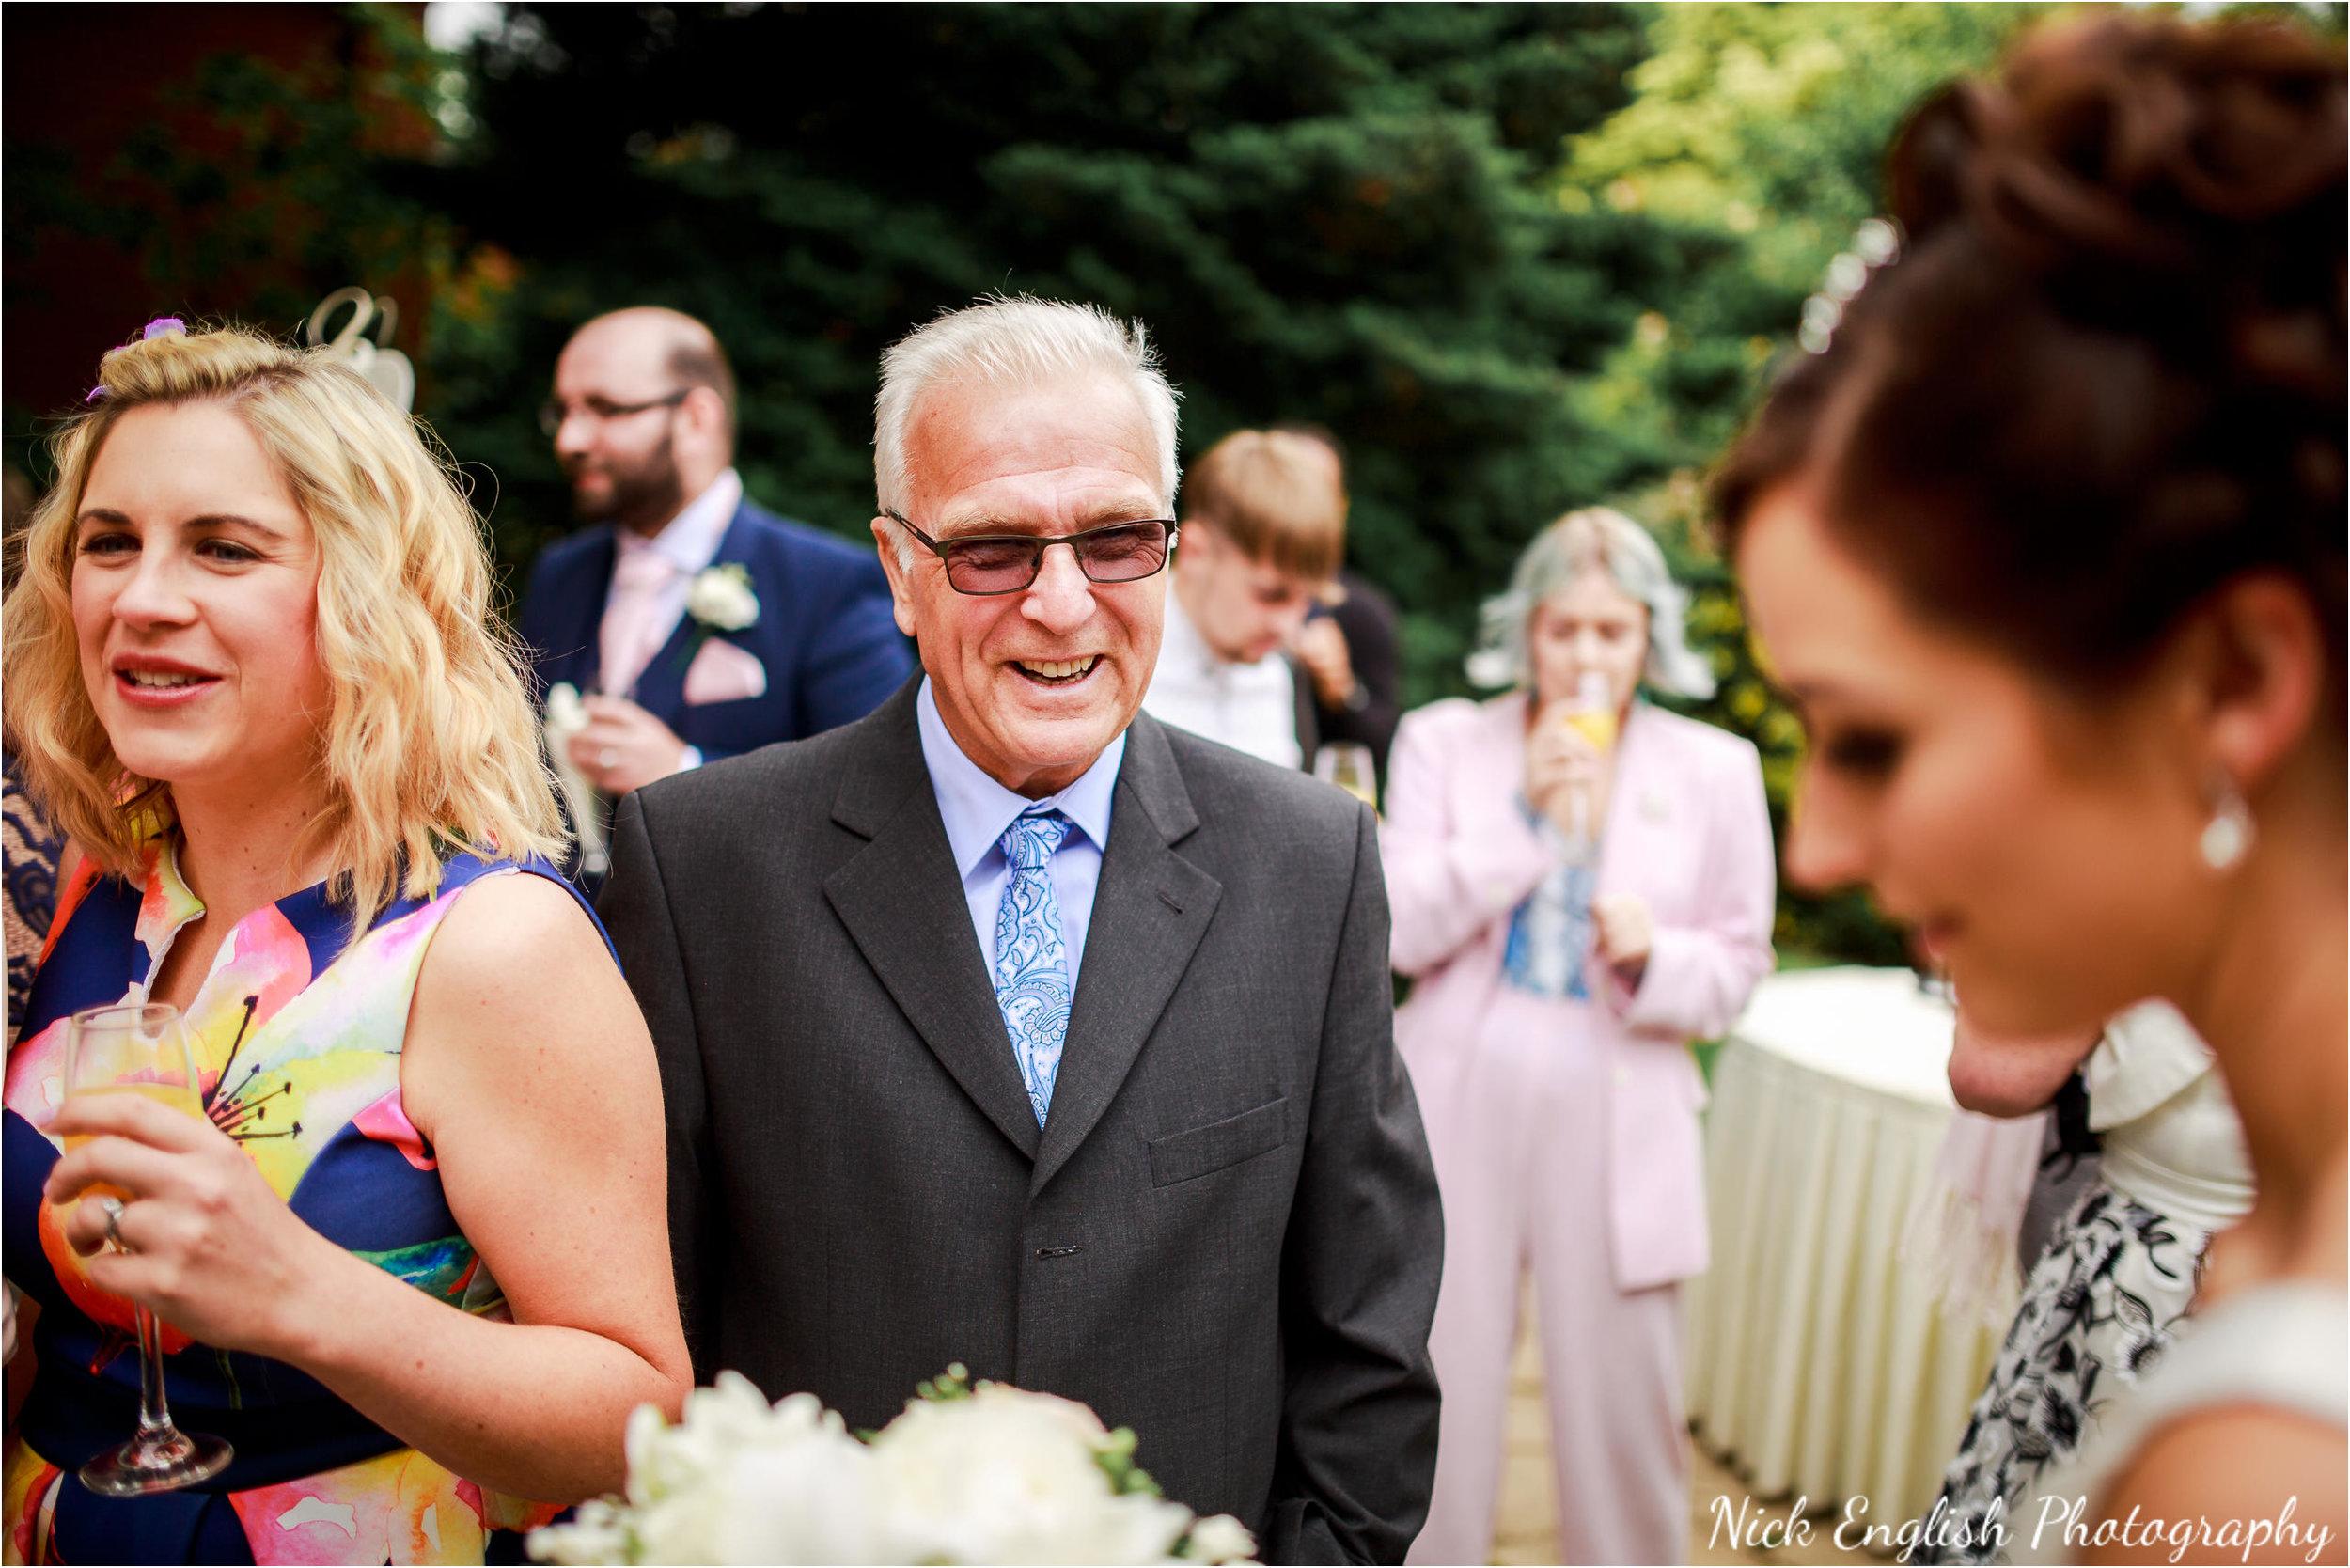 Emily David Wedding Photographs at Barton Grange Preston by Nick English Photography 113jpg.jpeg